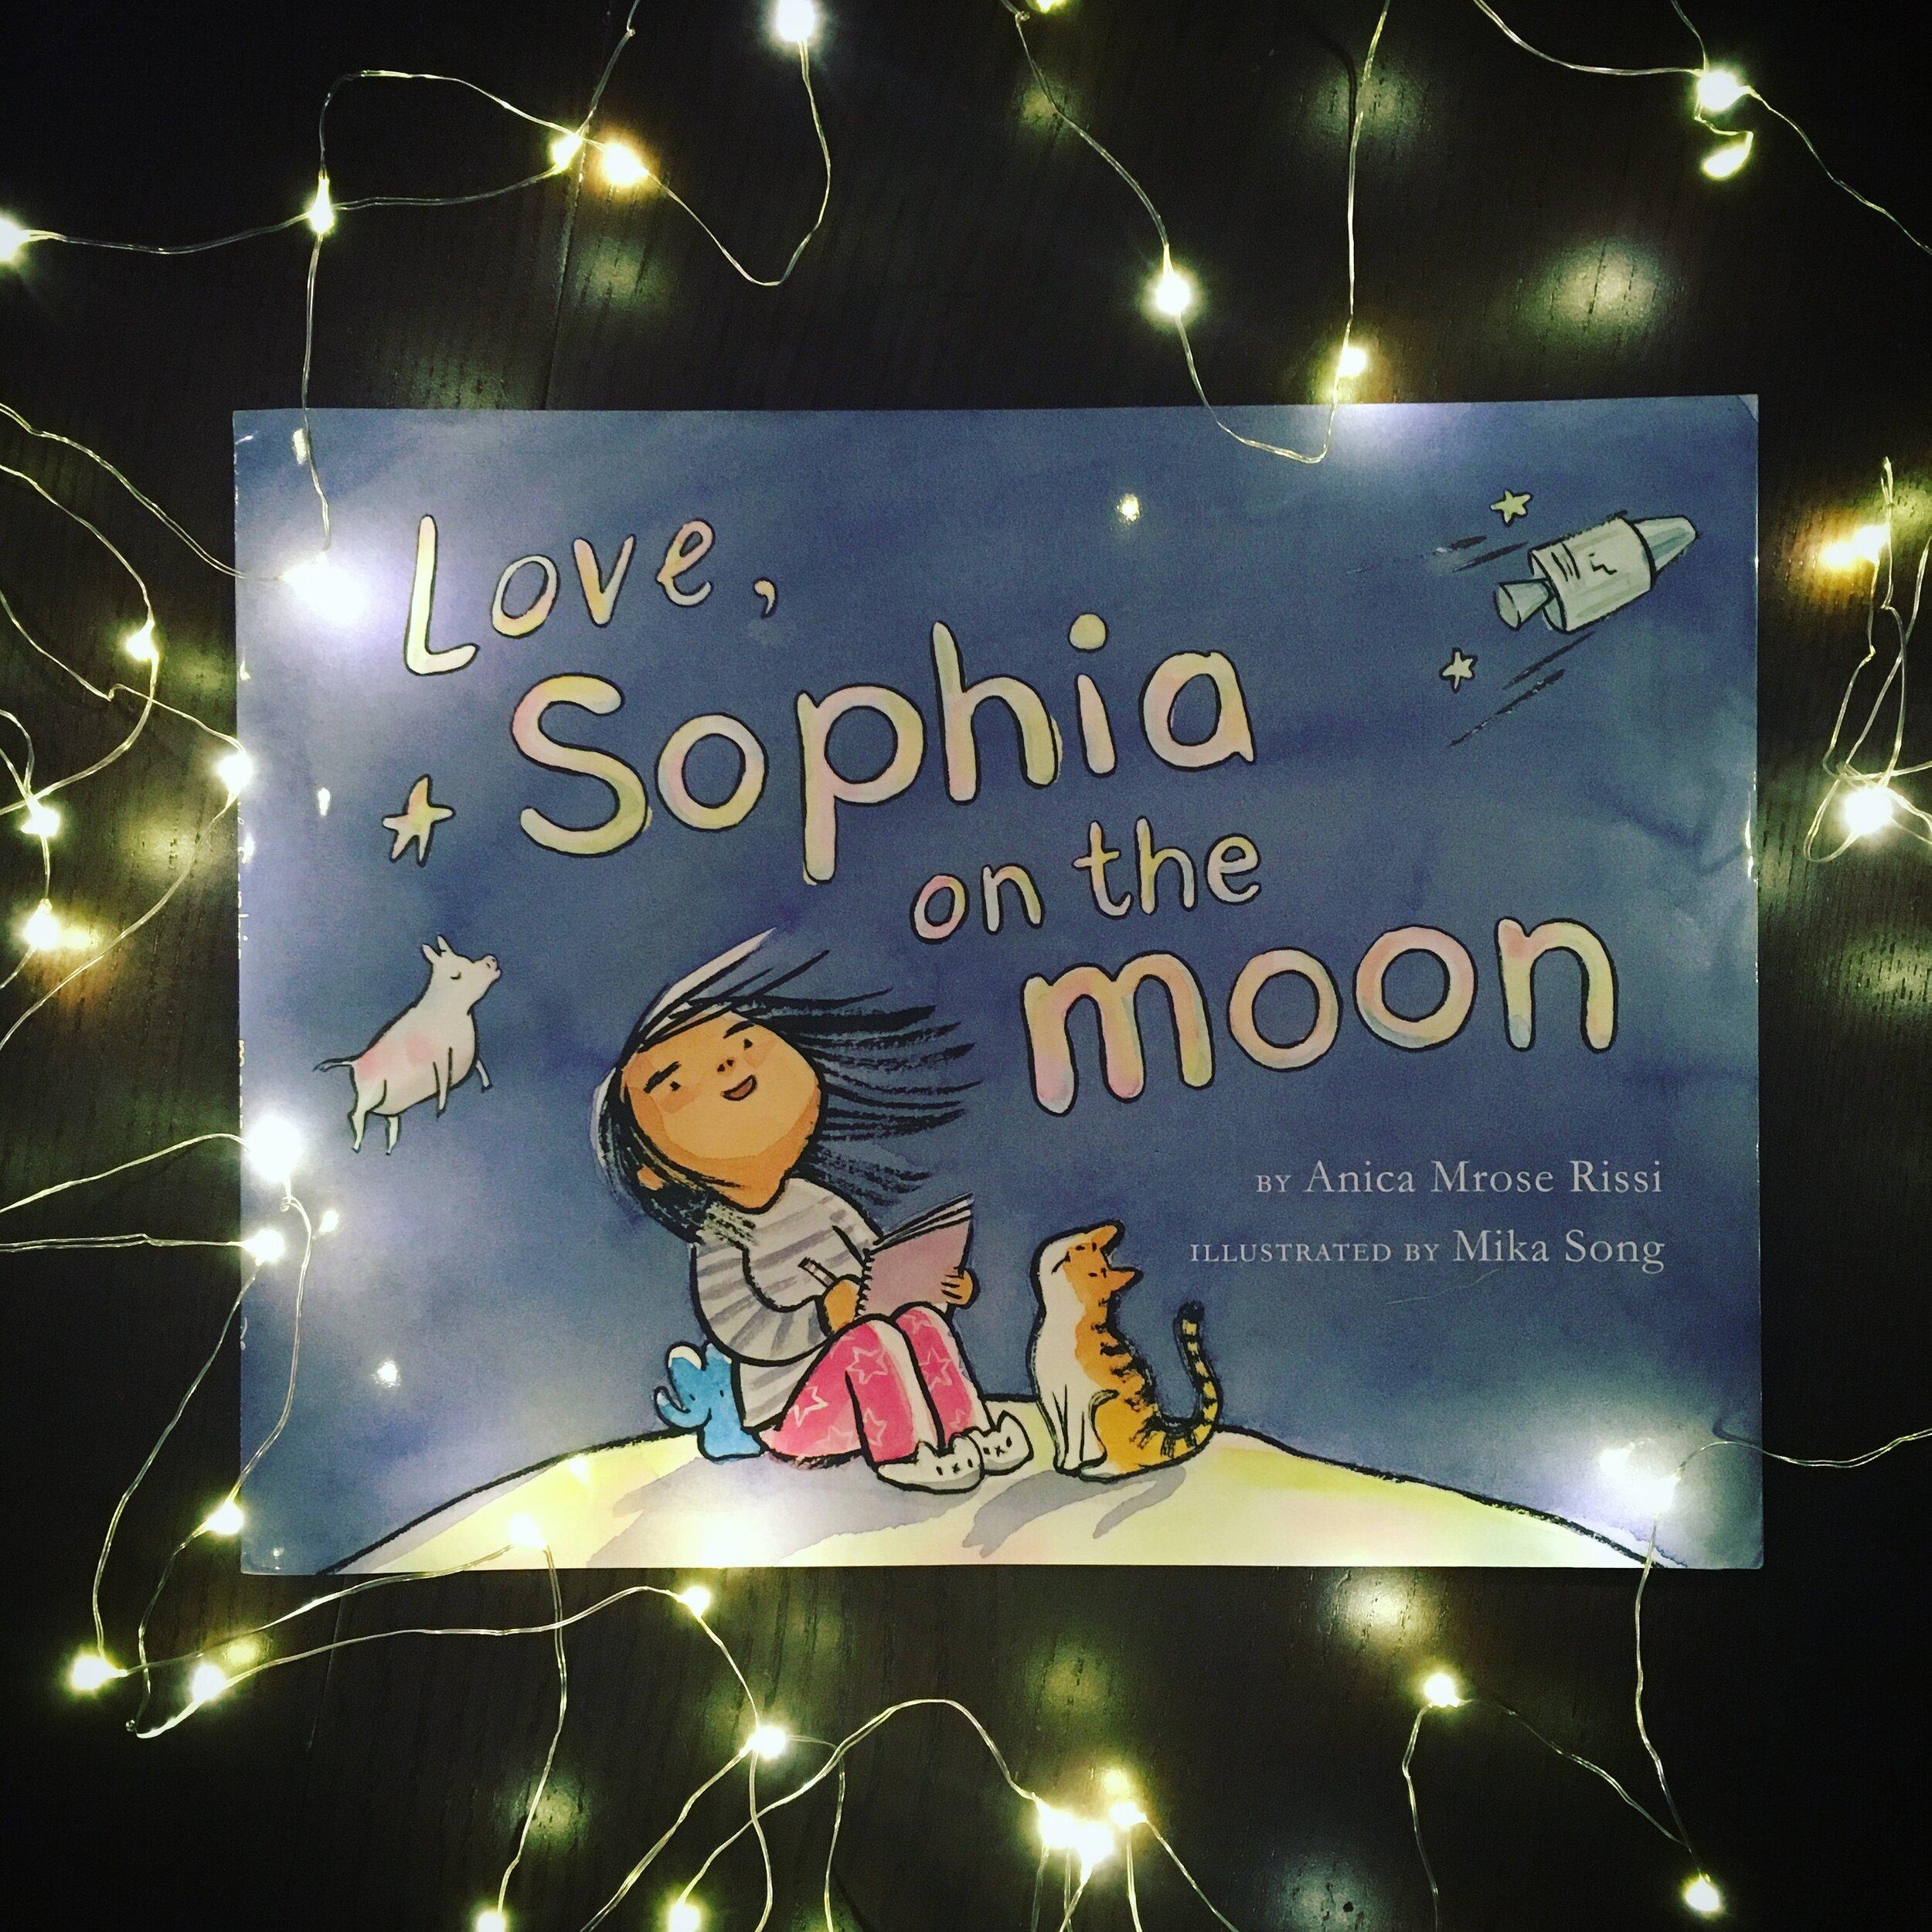 Life on earth isn't fair, so Sophia is off to the moon…